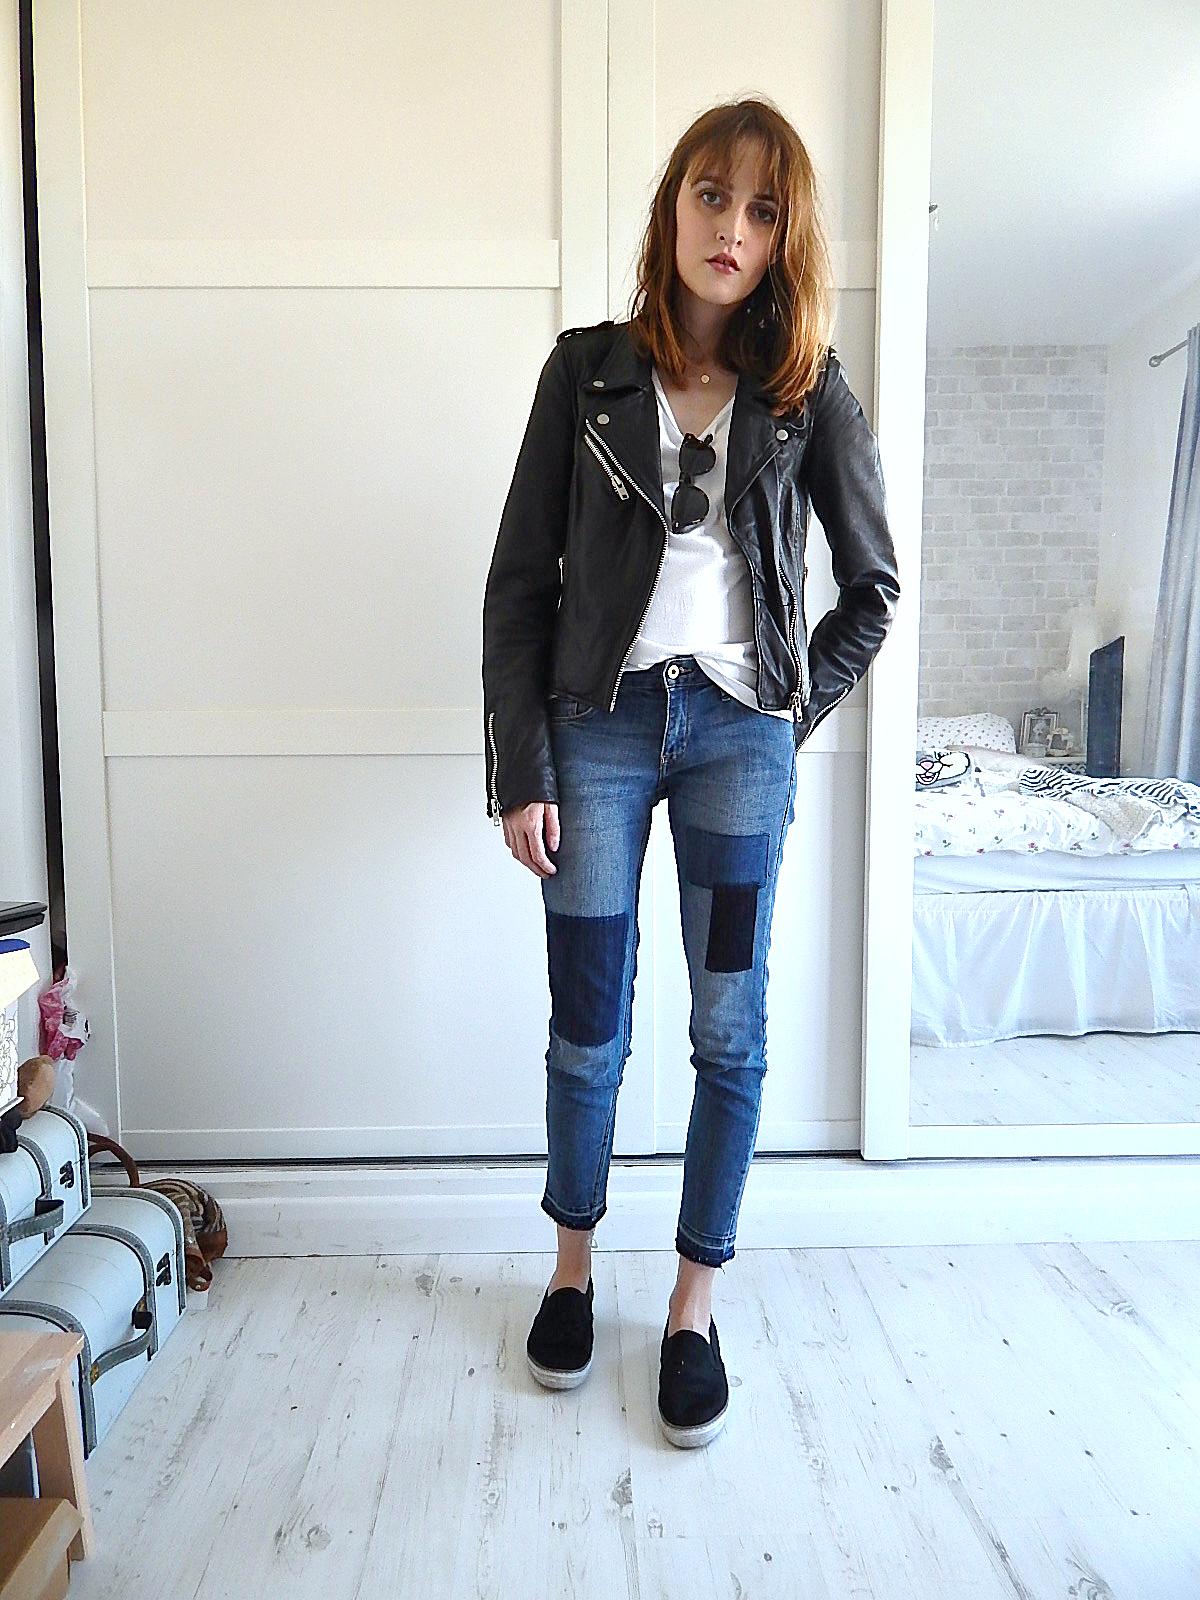 h&m patchwork denim jeans